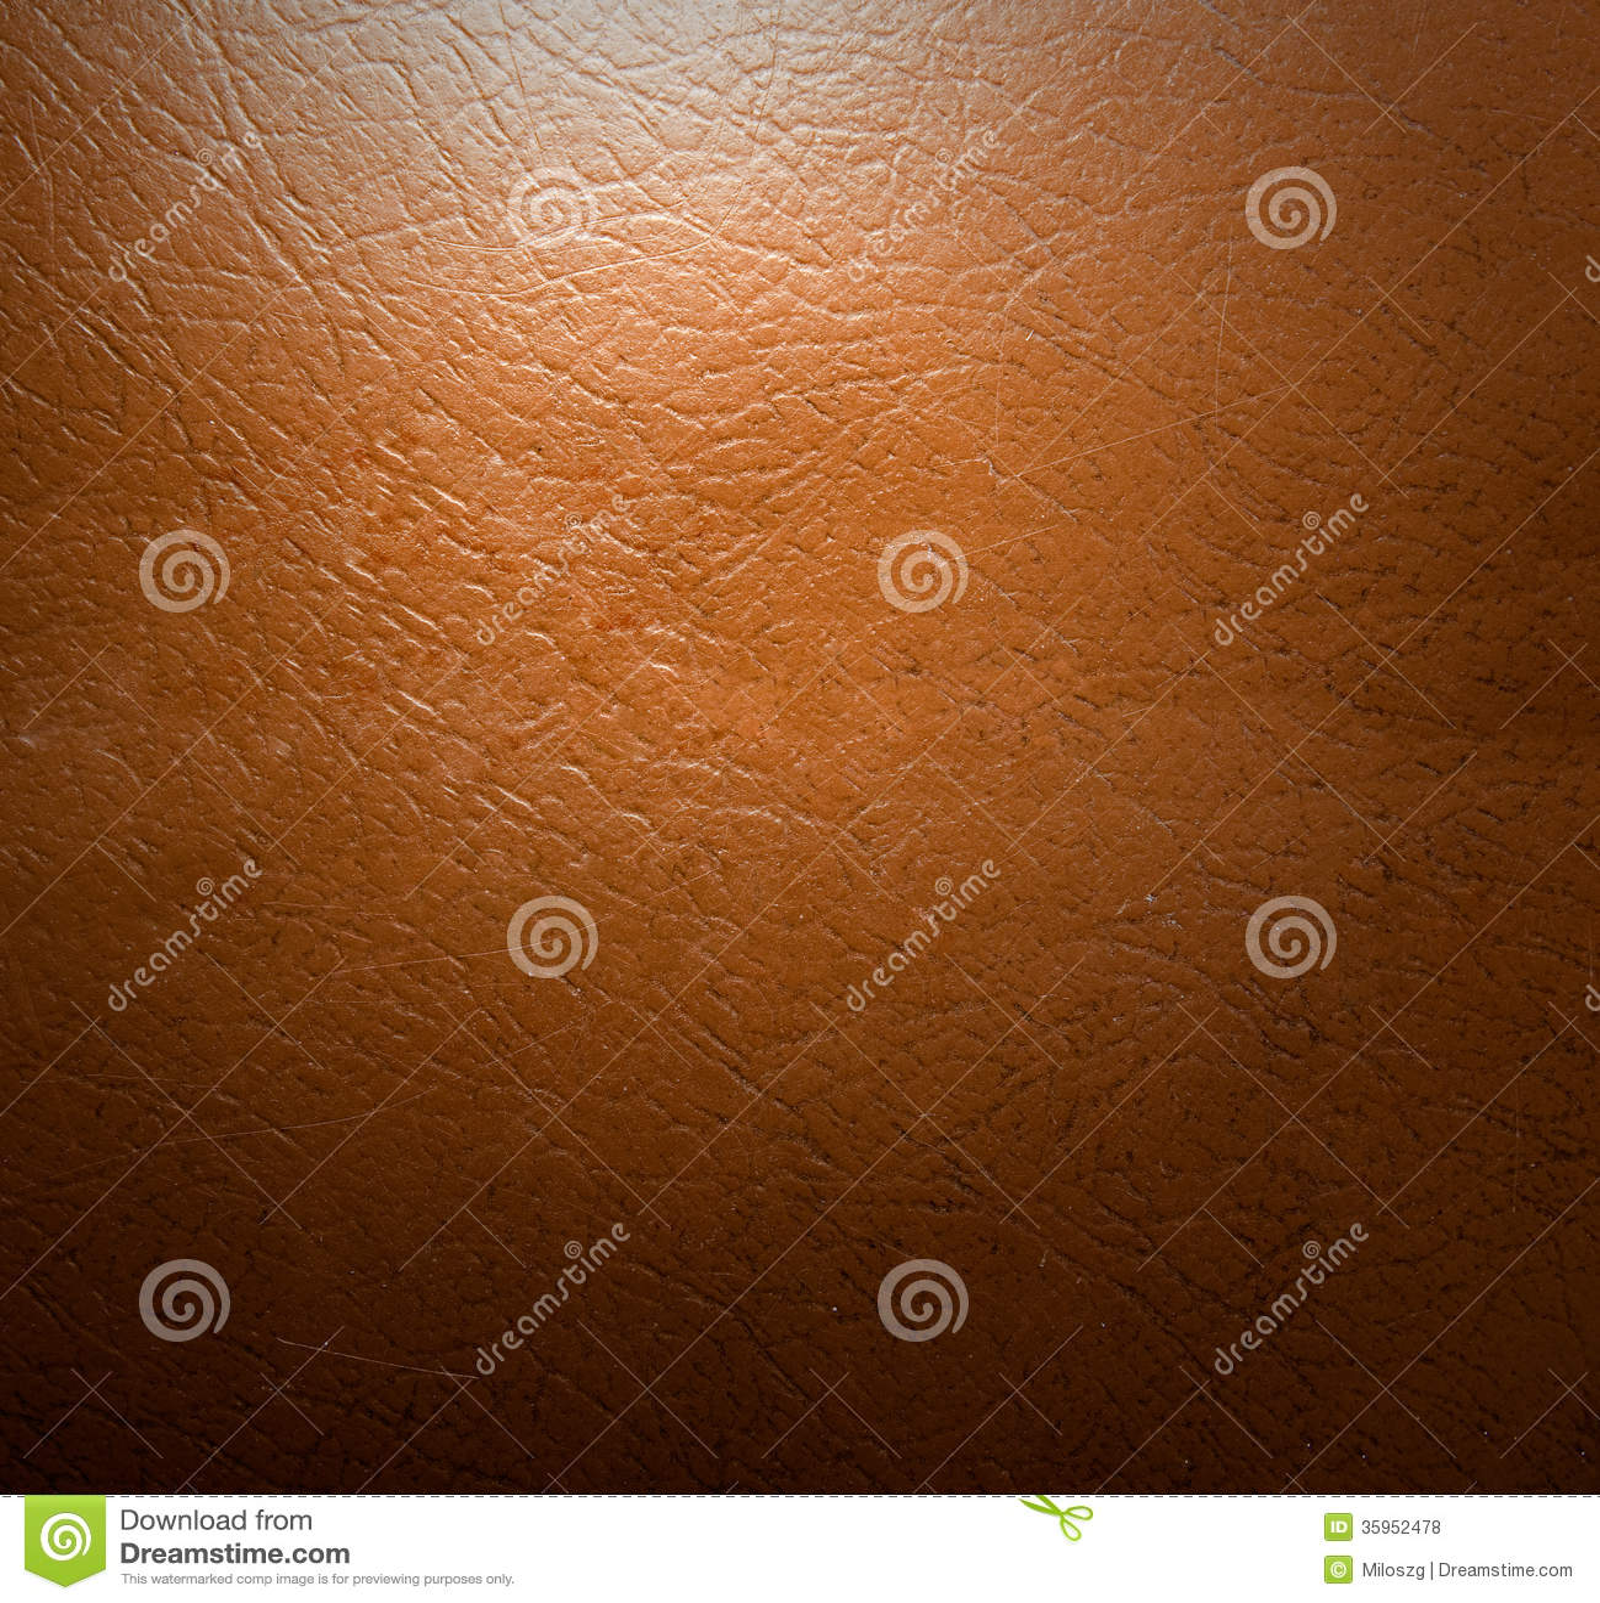 Textura o fondo de cuero